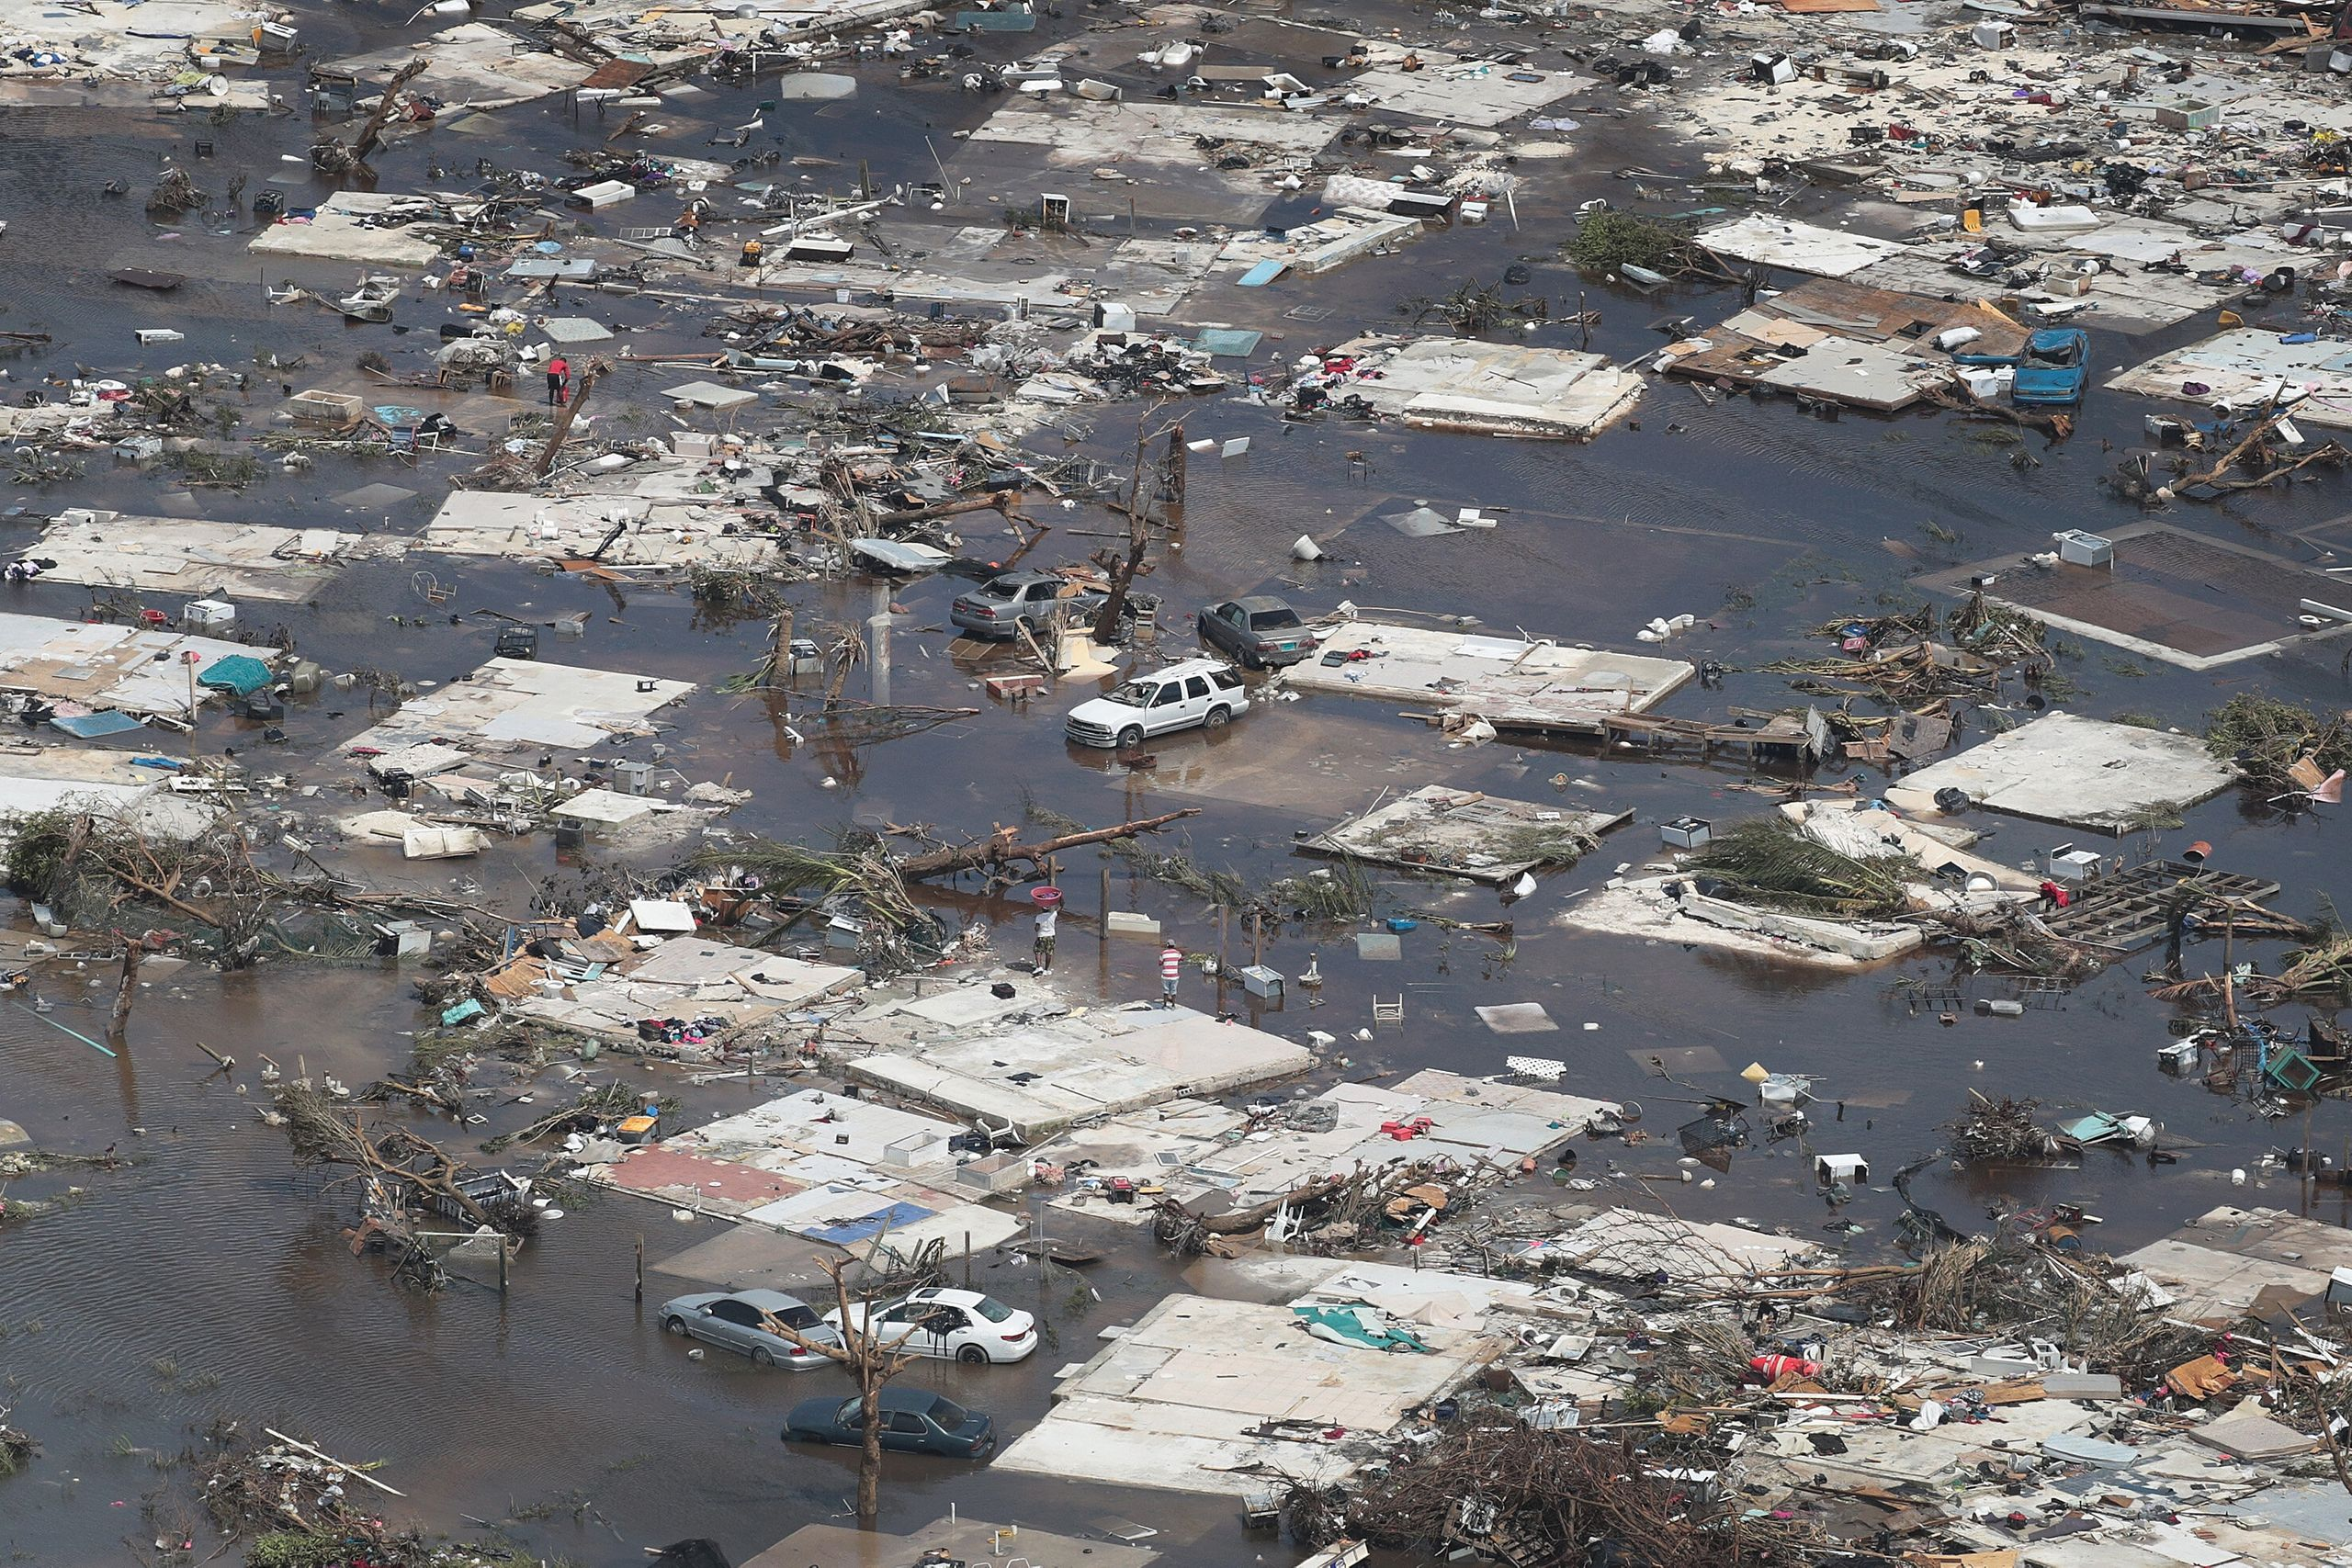 Westlake Legal Group 5d7161993b0000683fcf2754 Dramatic Images Show Hurricane Dorian Destruction From Above